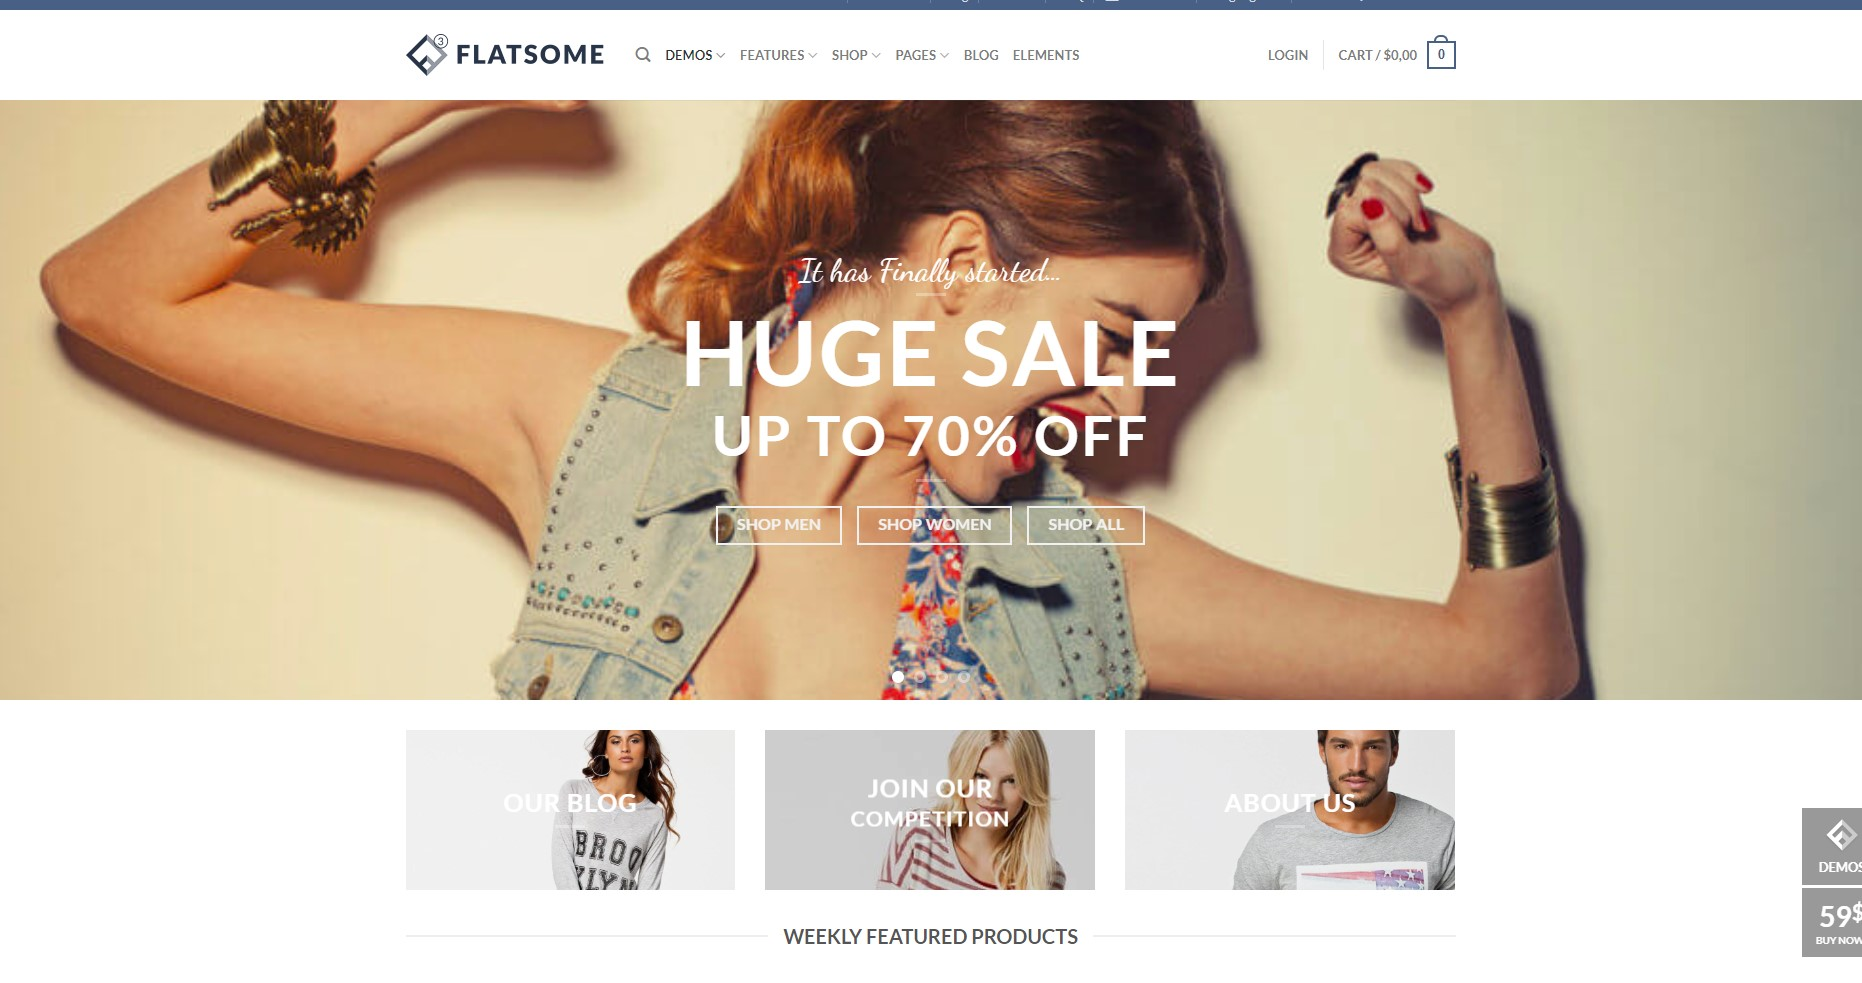 Flatsome Minimalist WordPress Theme